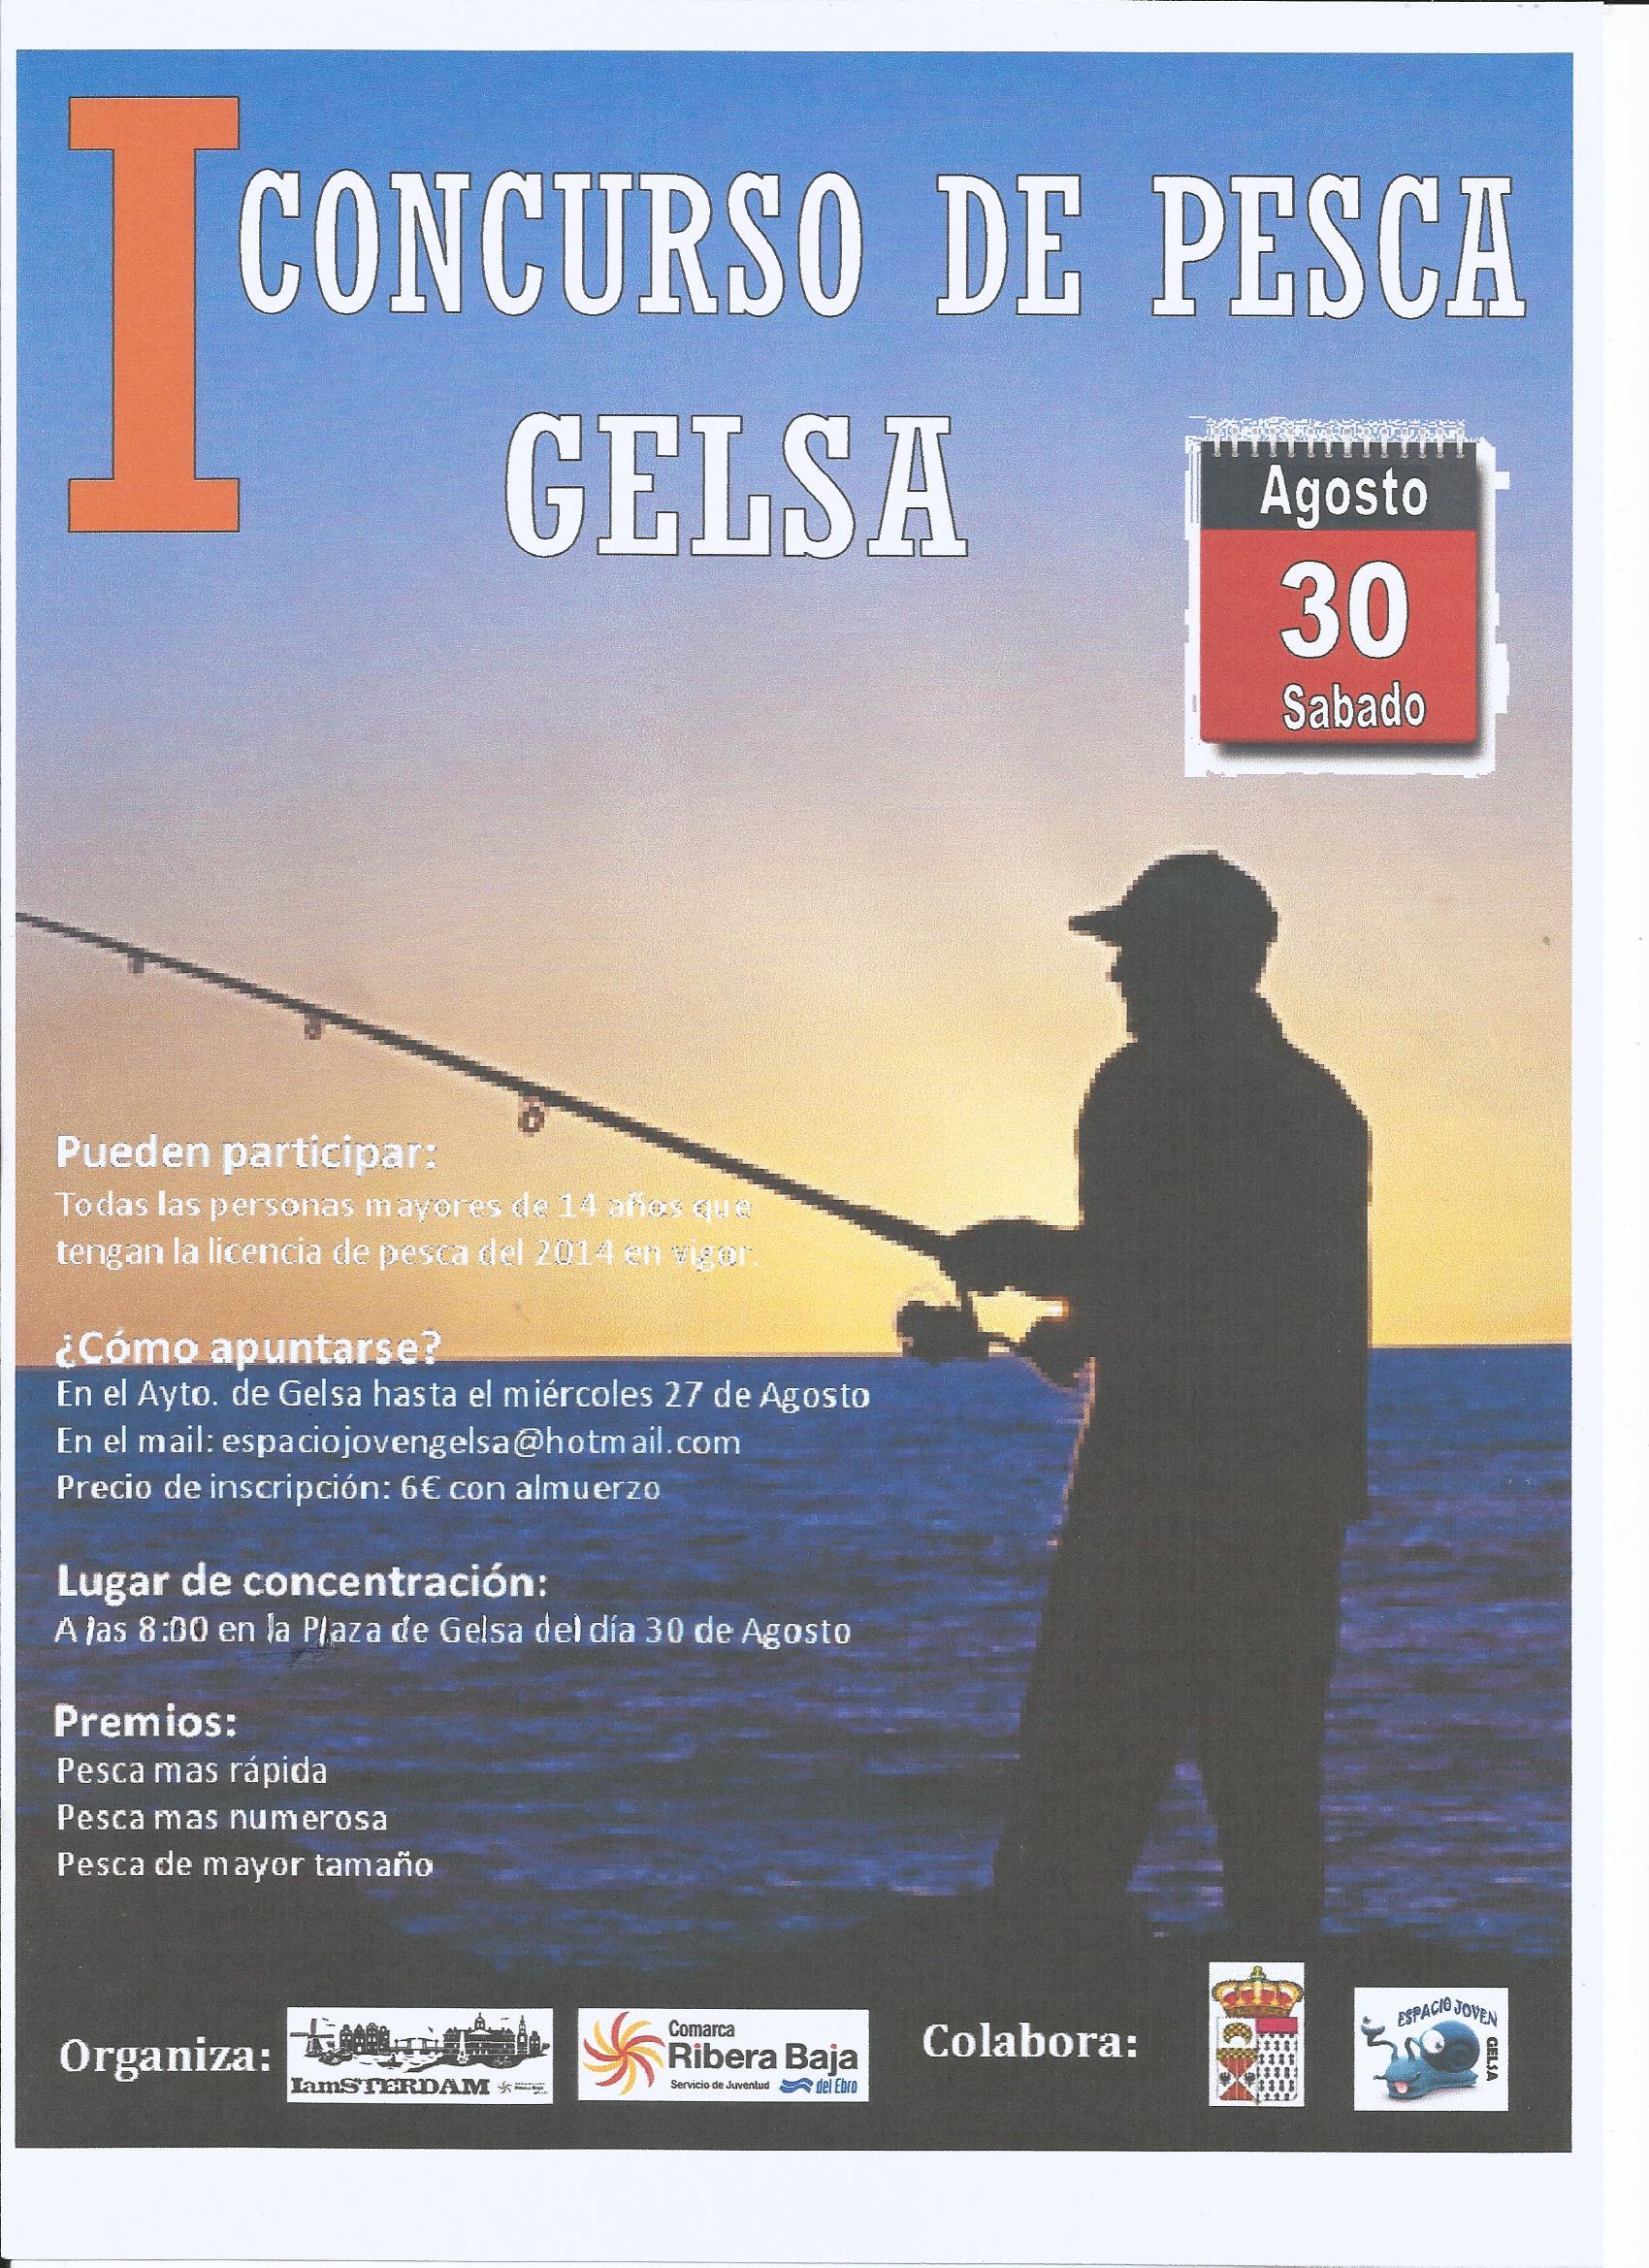 Primer concurso de pesca Gelsa